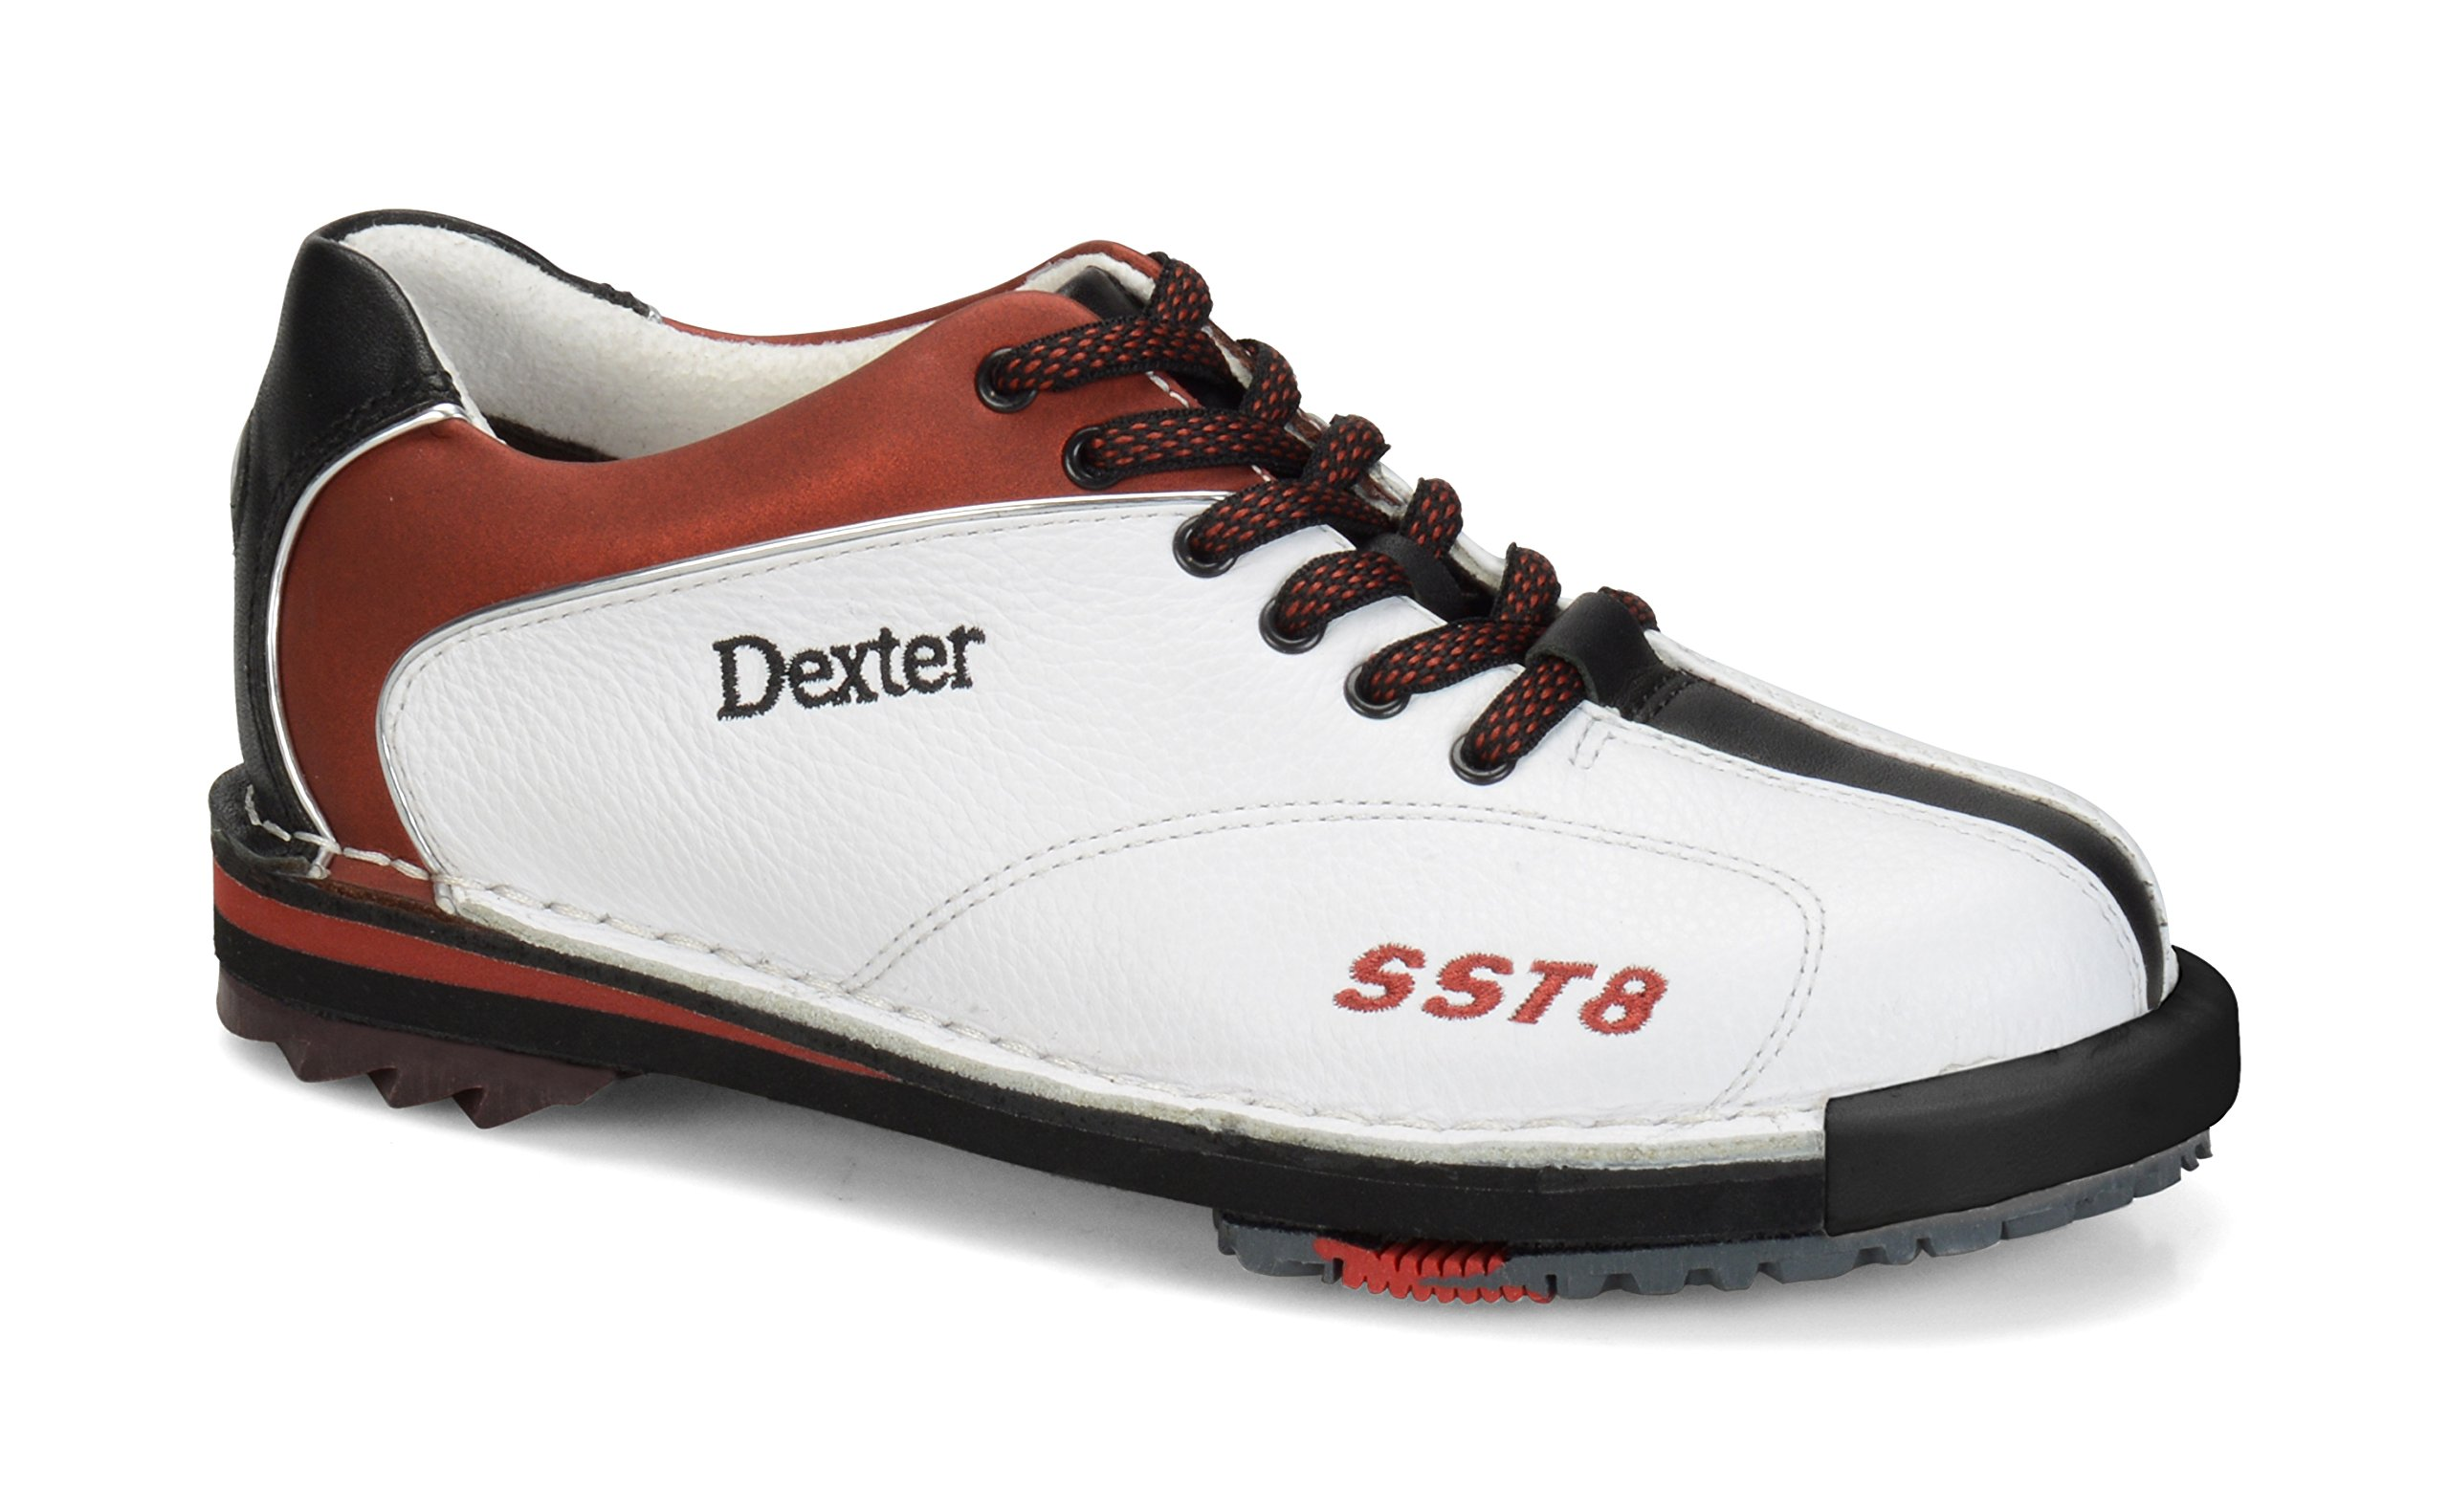 Dexter Women's SST 8 LE Wide Bowling Shoes, White/Red/Black, 7.0 by Dexter